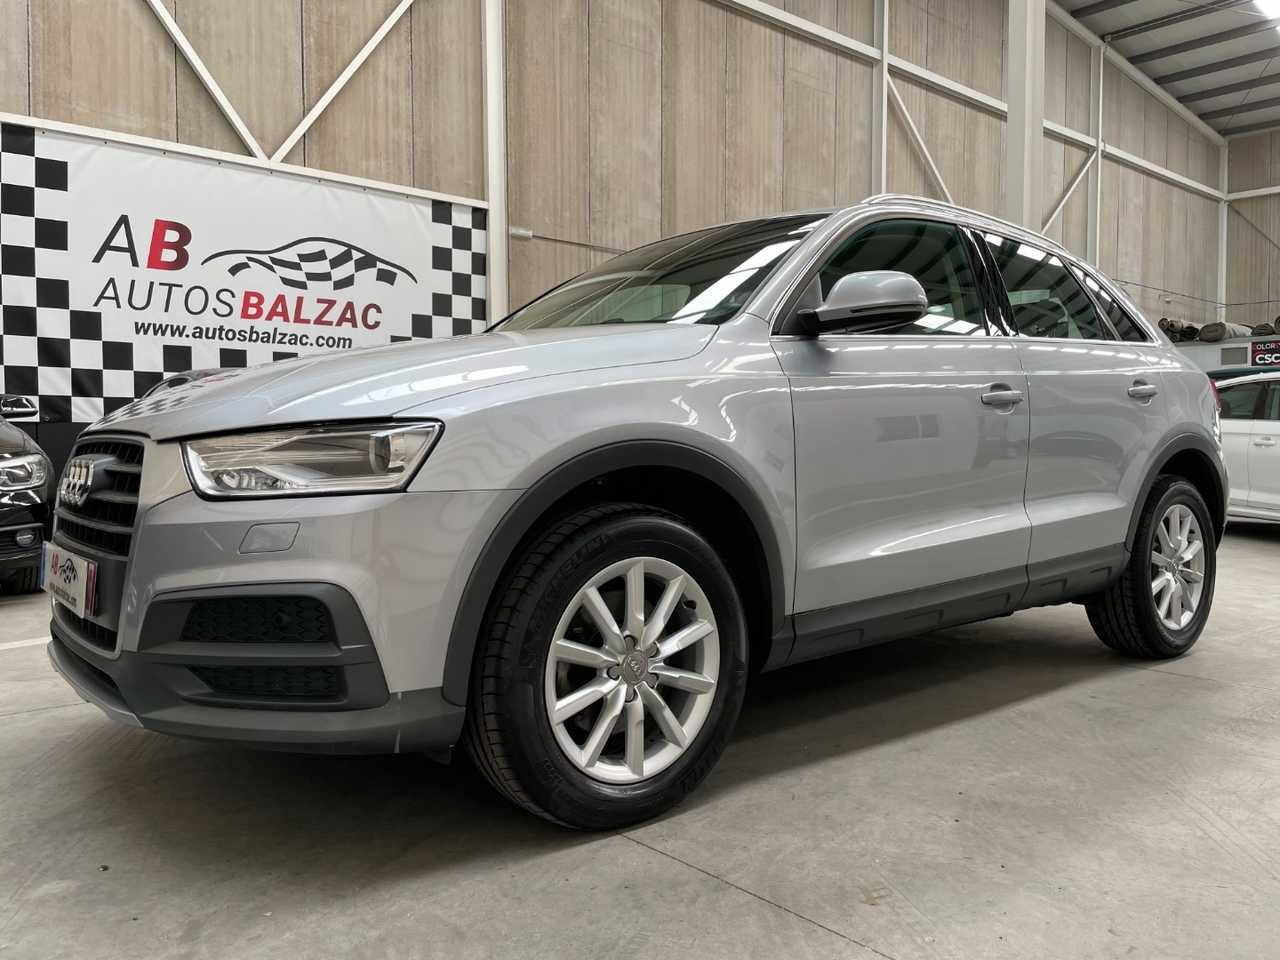 Audi Q3 ocasión segunda mano 2018 Diésel por 20.990€ en Málaga